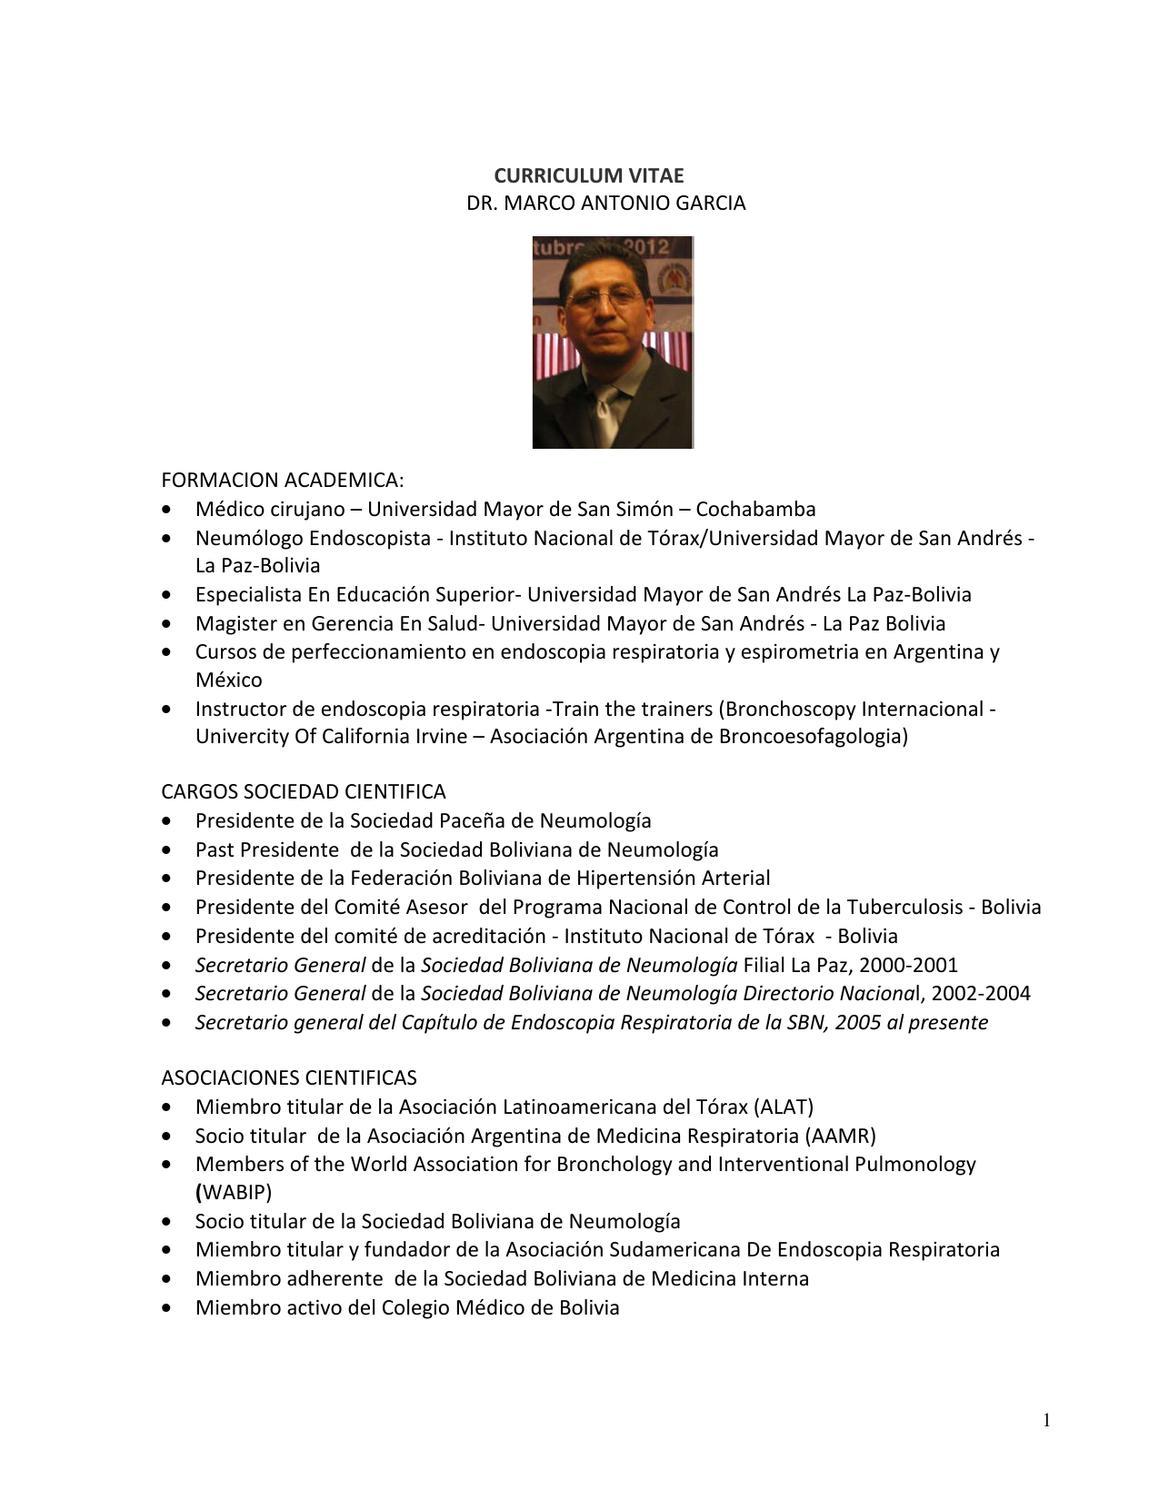 Cvmarcogarciaendoscopia By Asociacion Latinoamericana De Torax Alat